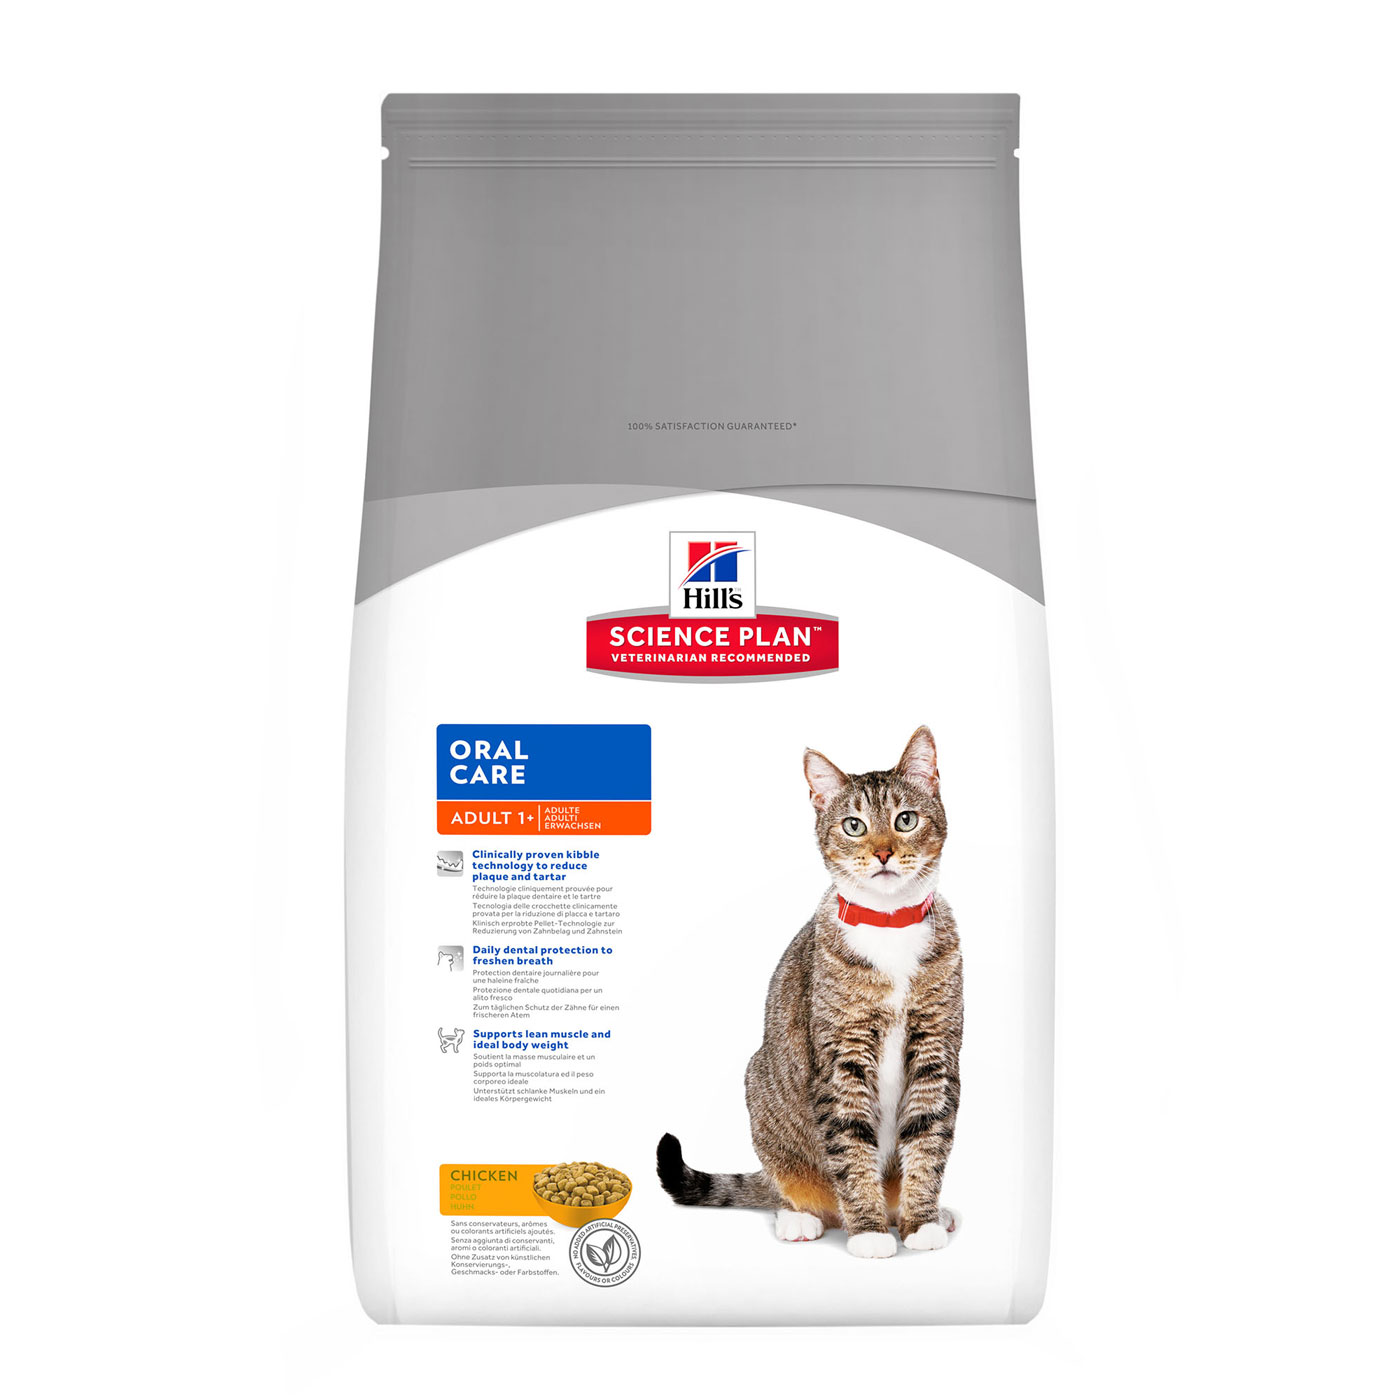 HILL'S SCIENCE PLAN ADULT ORAL CARE – сухой корм с курицей для взрослых котов